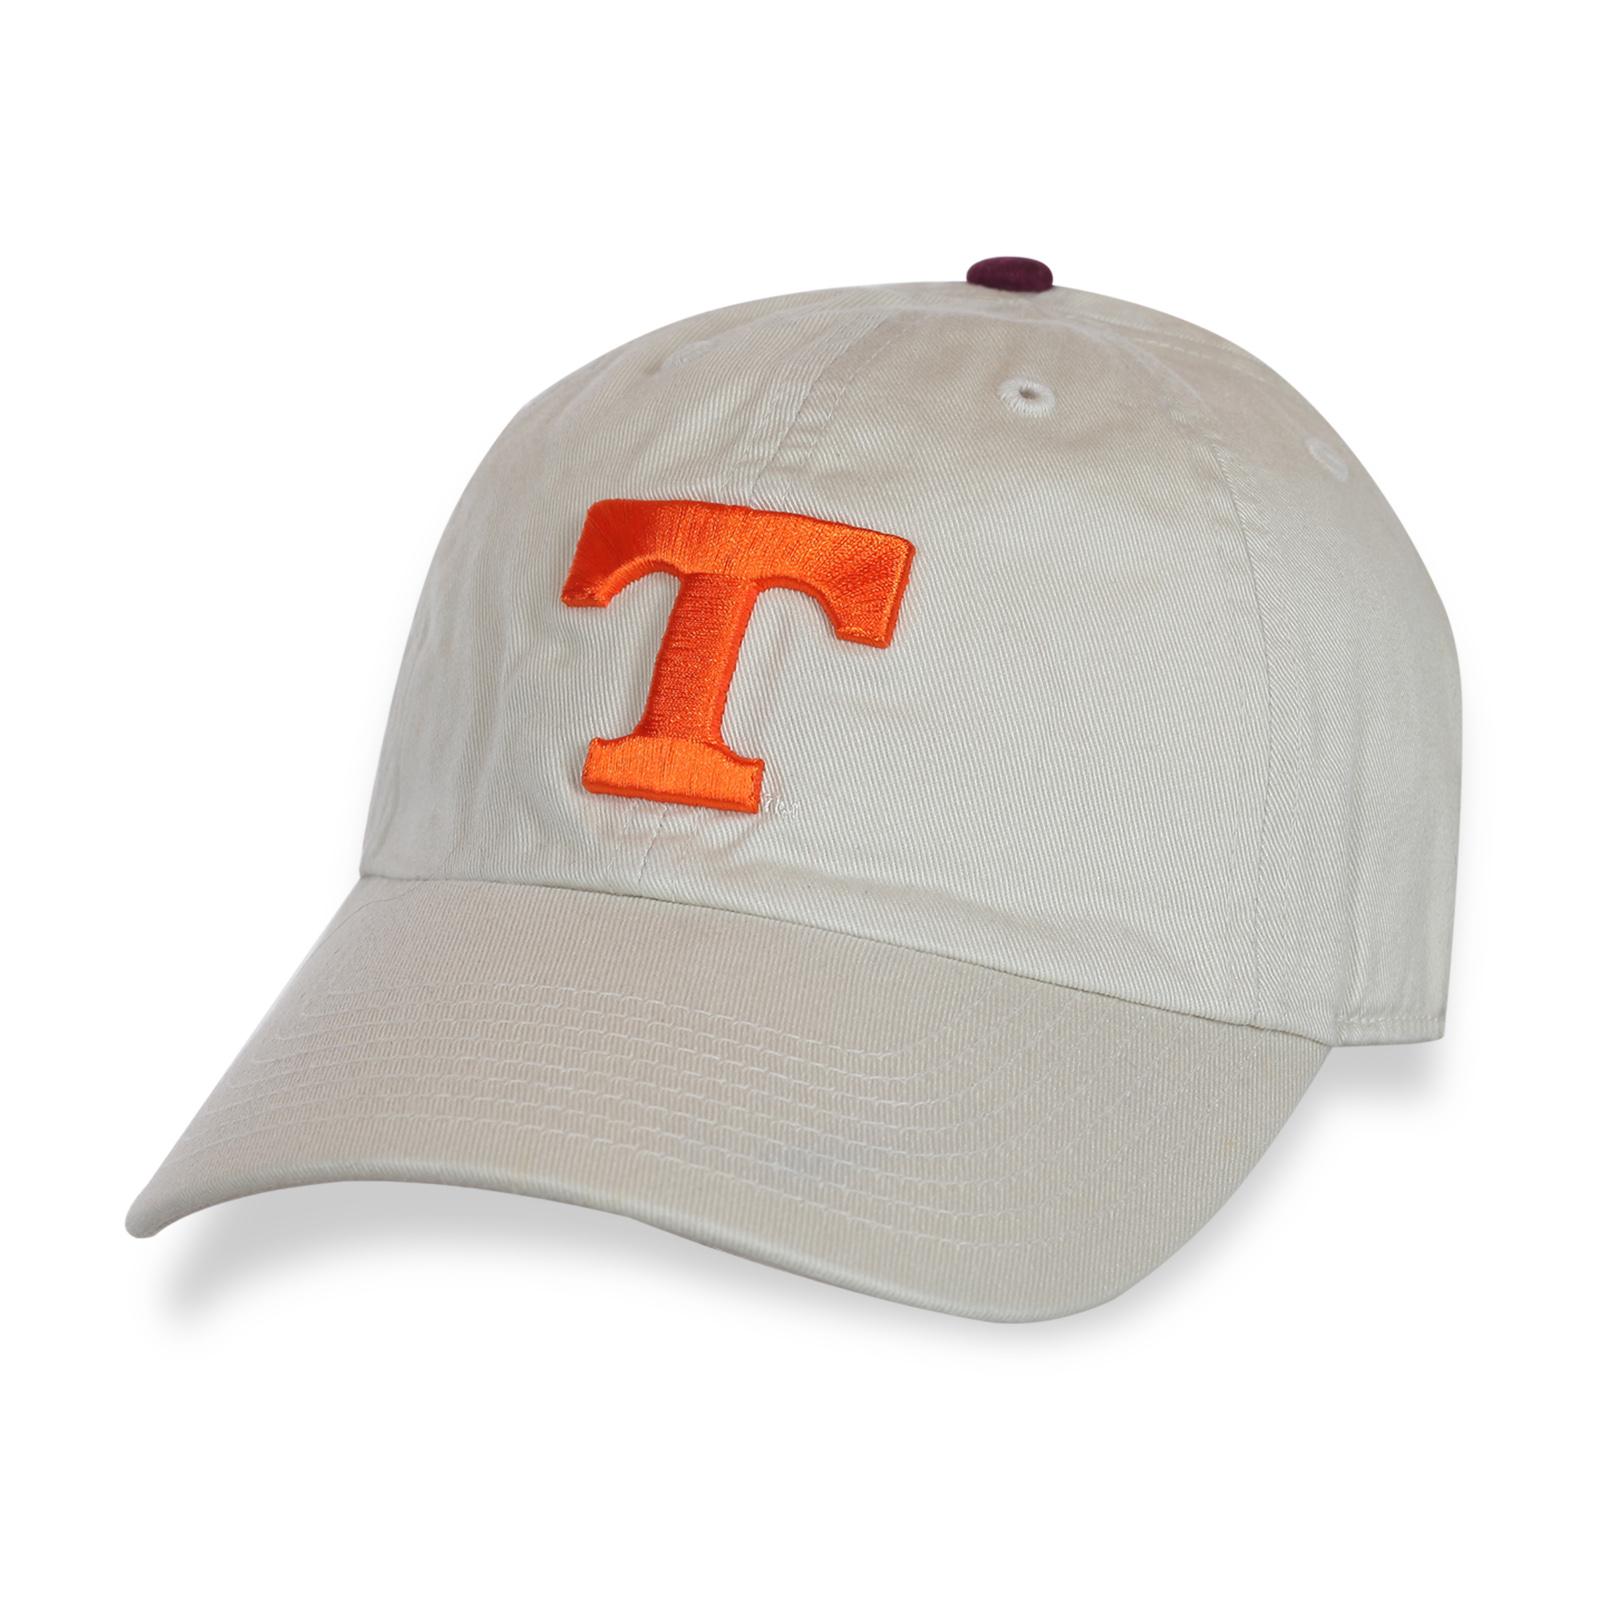 Аккуратная белая кепка T